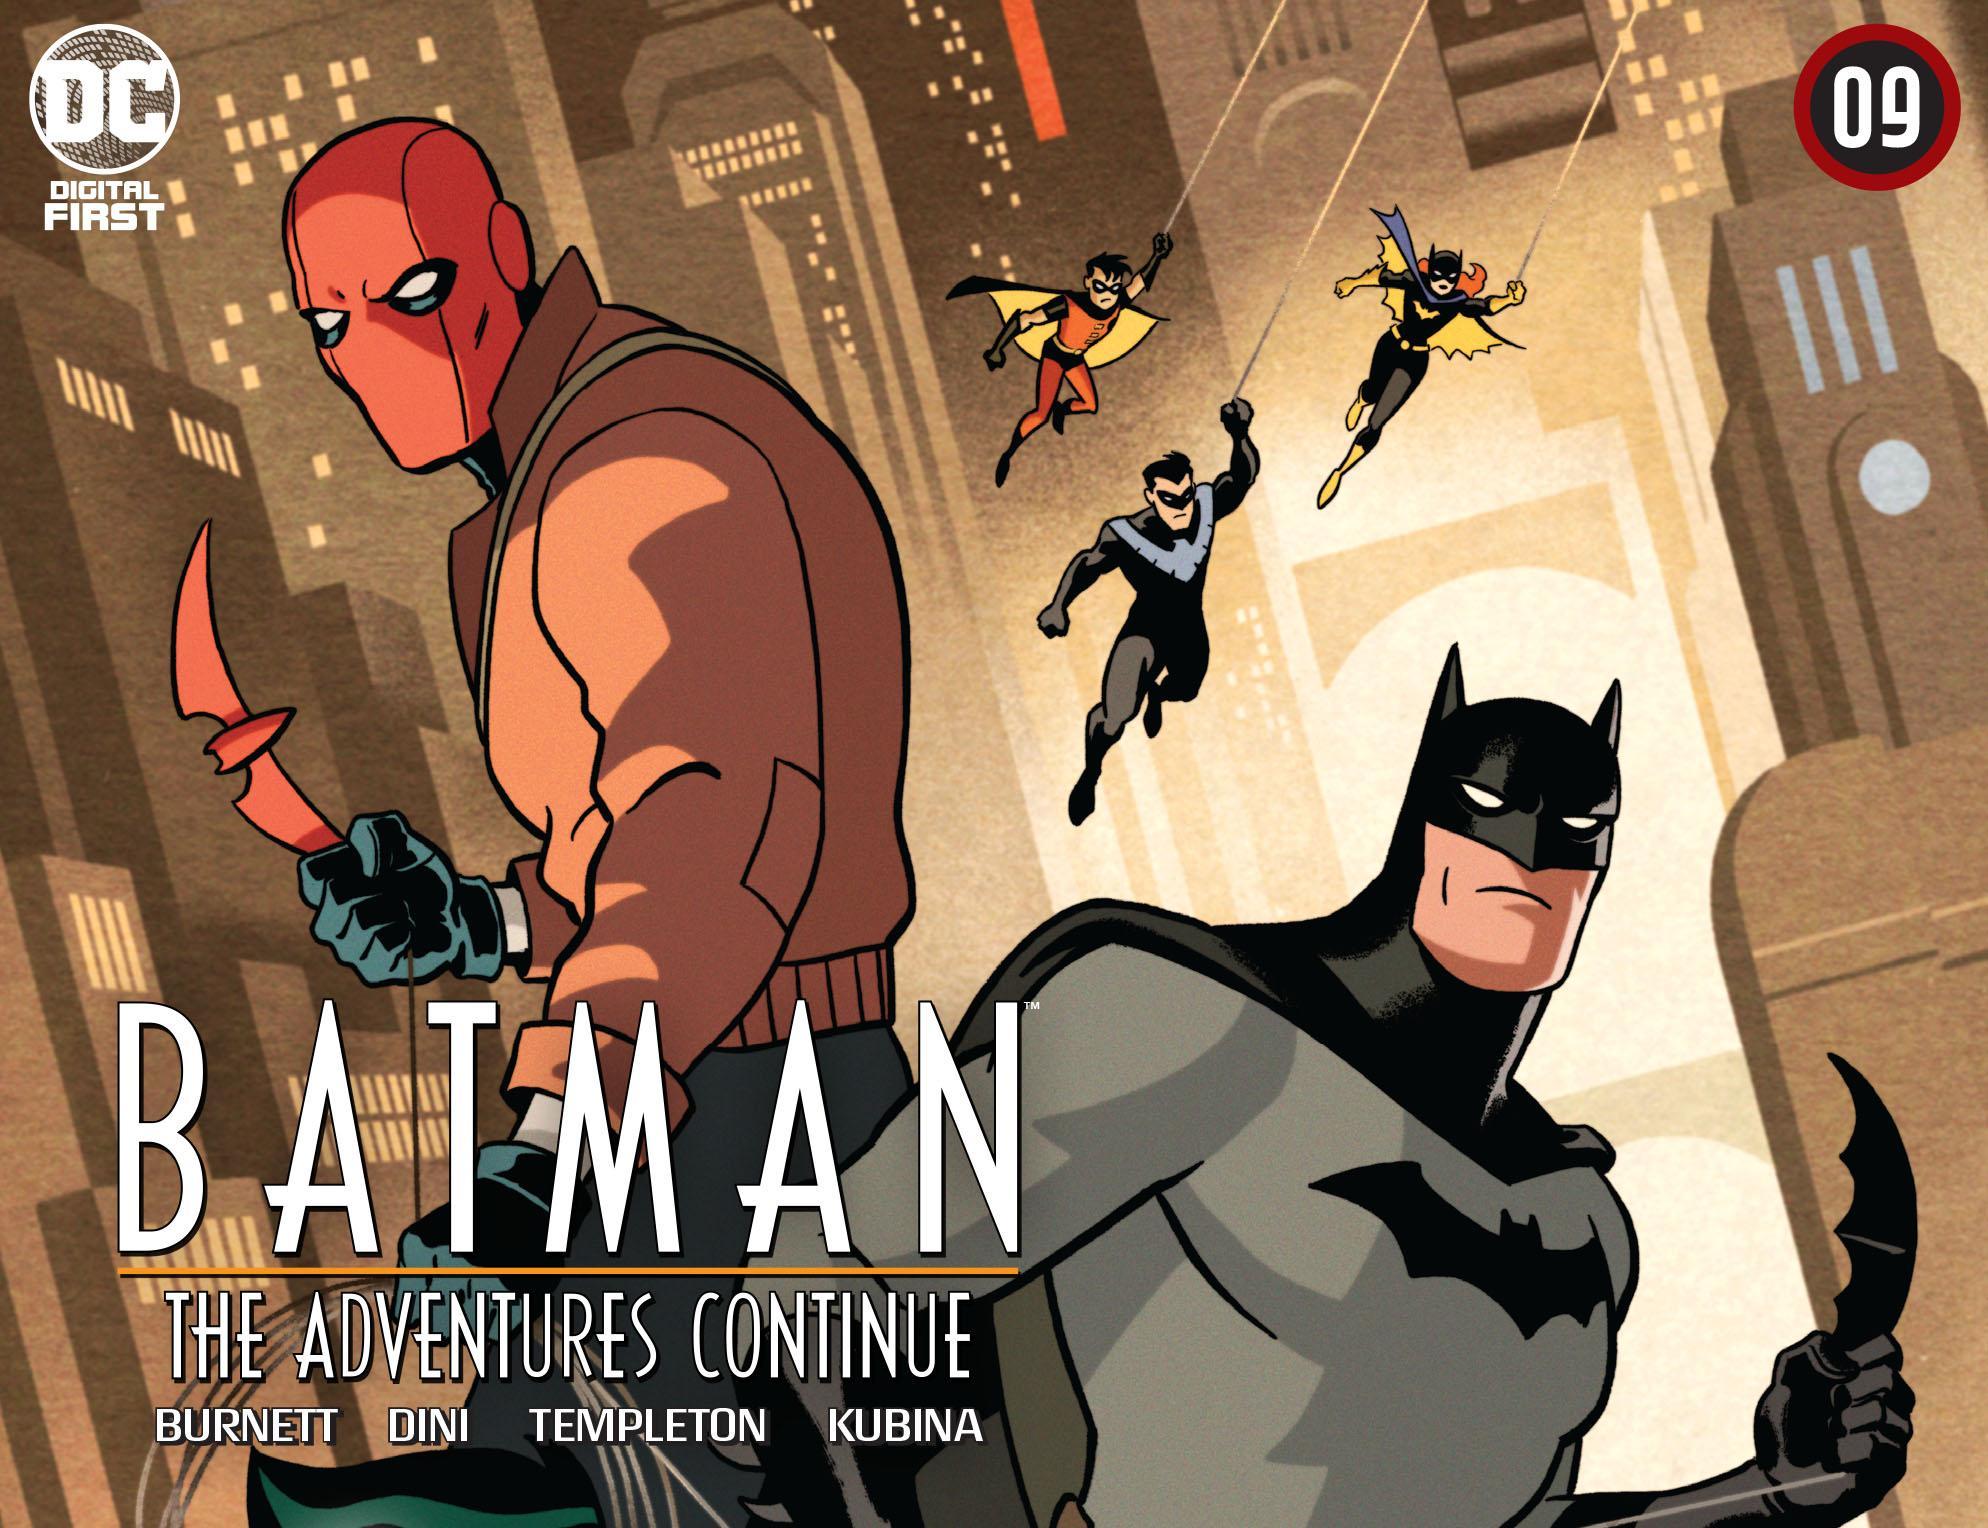 Batman-The Adventures Continue 009 2020 Digital Zone